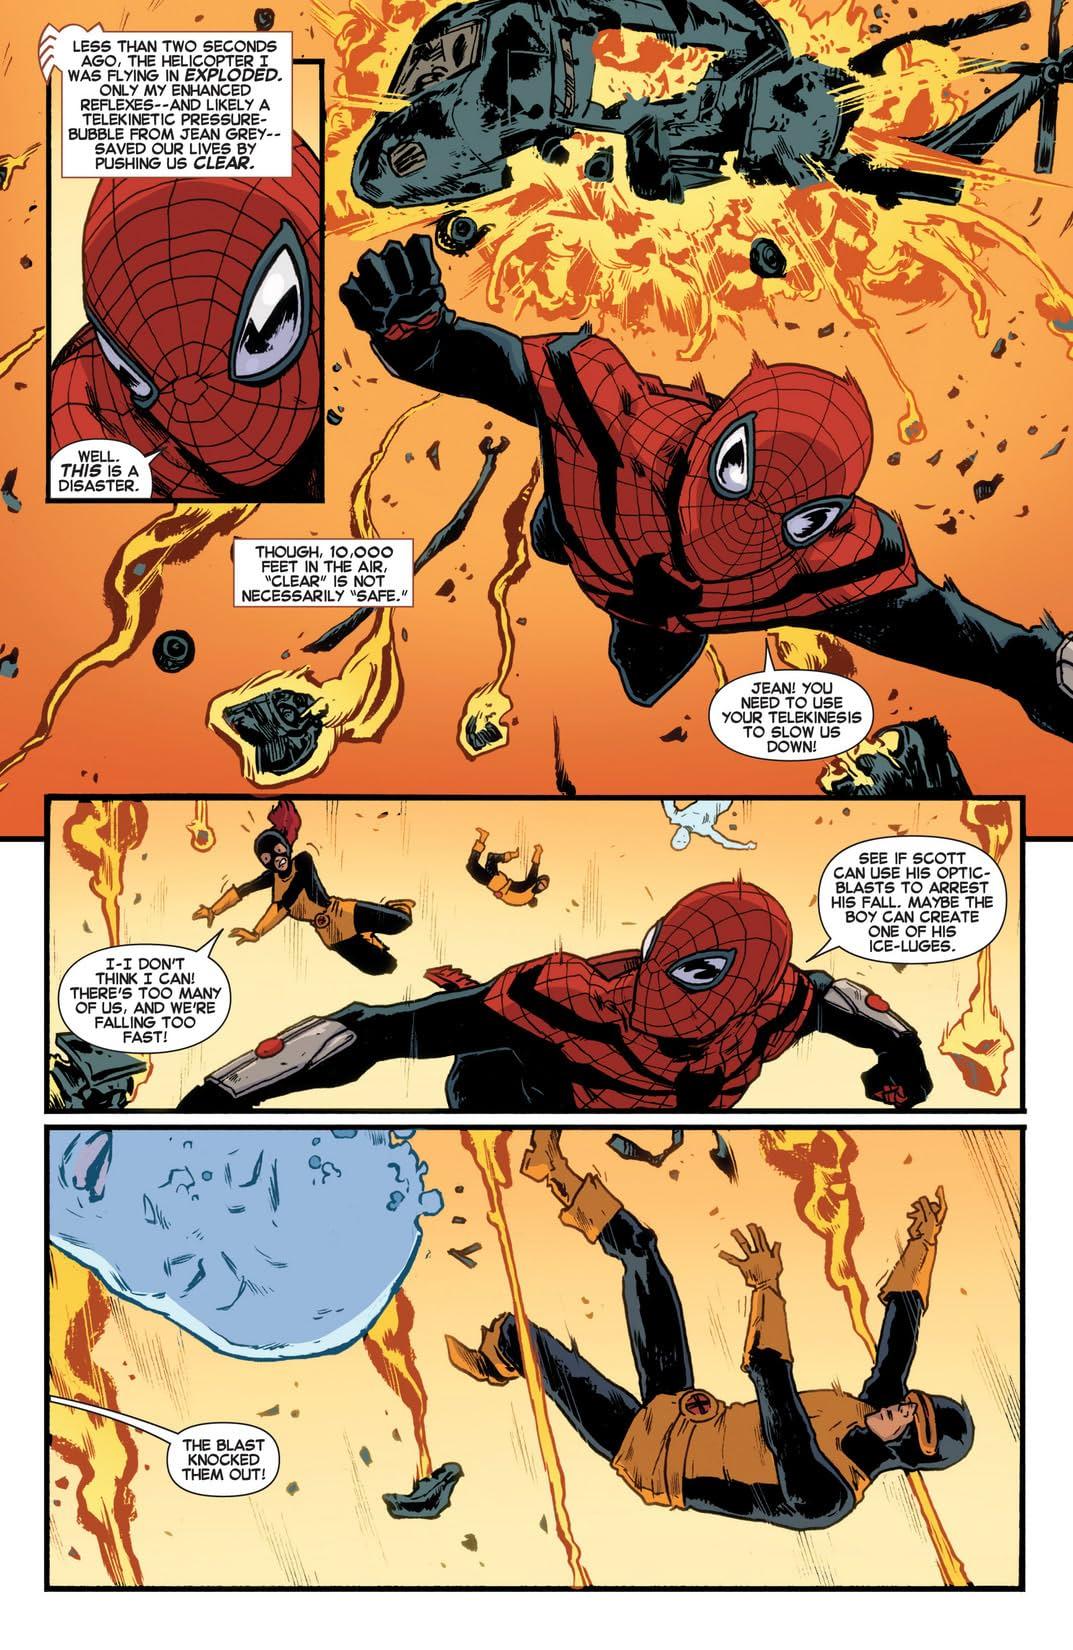 Superior Spider-Man Team-Up Special #1